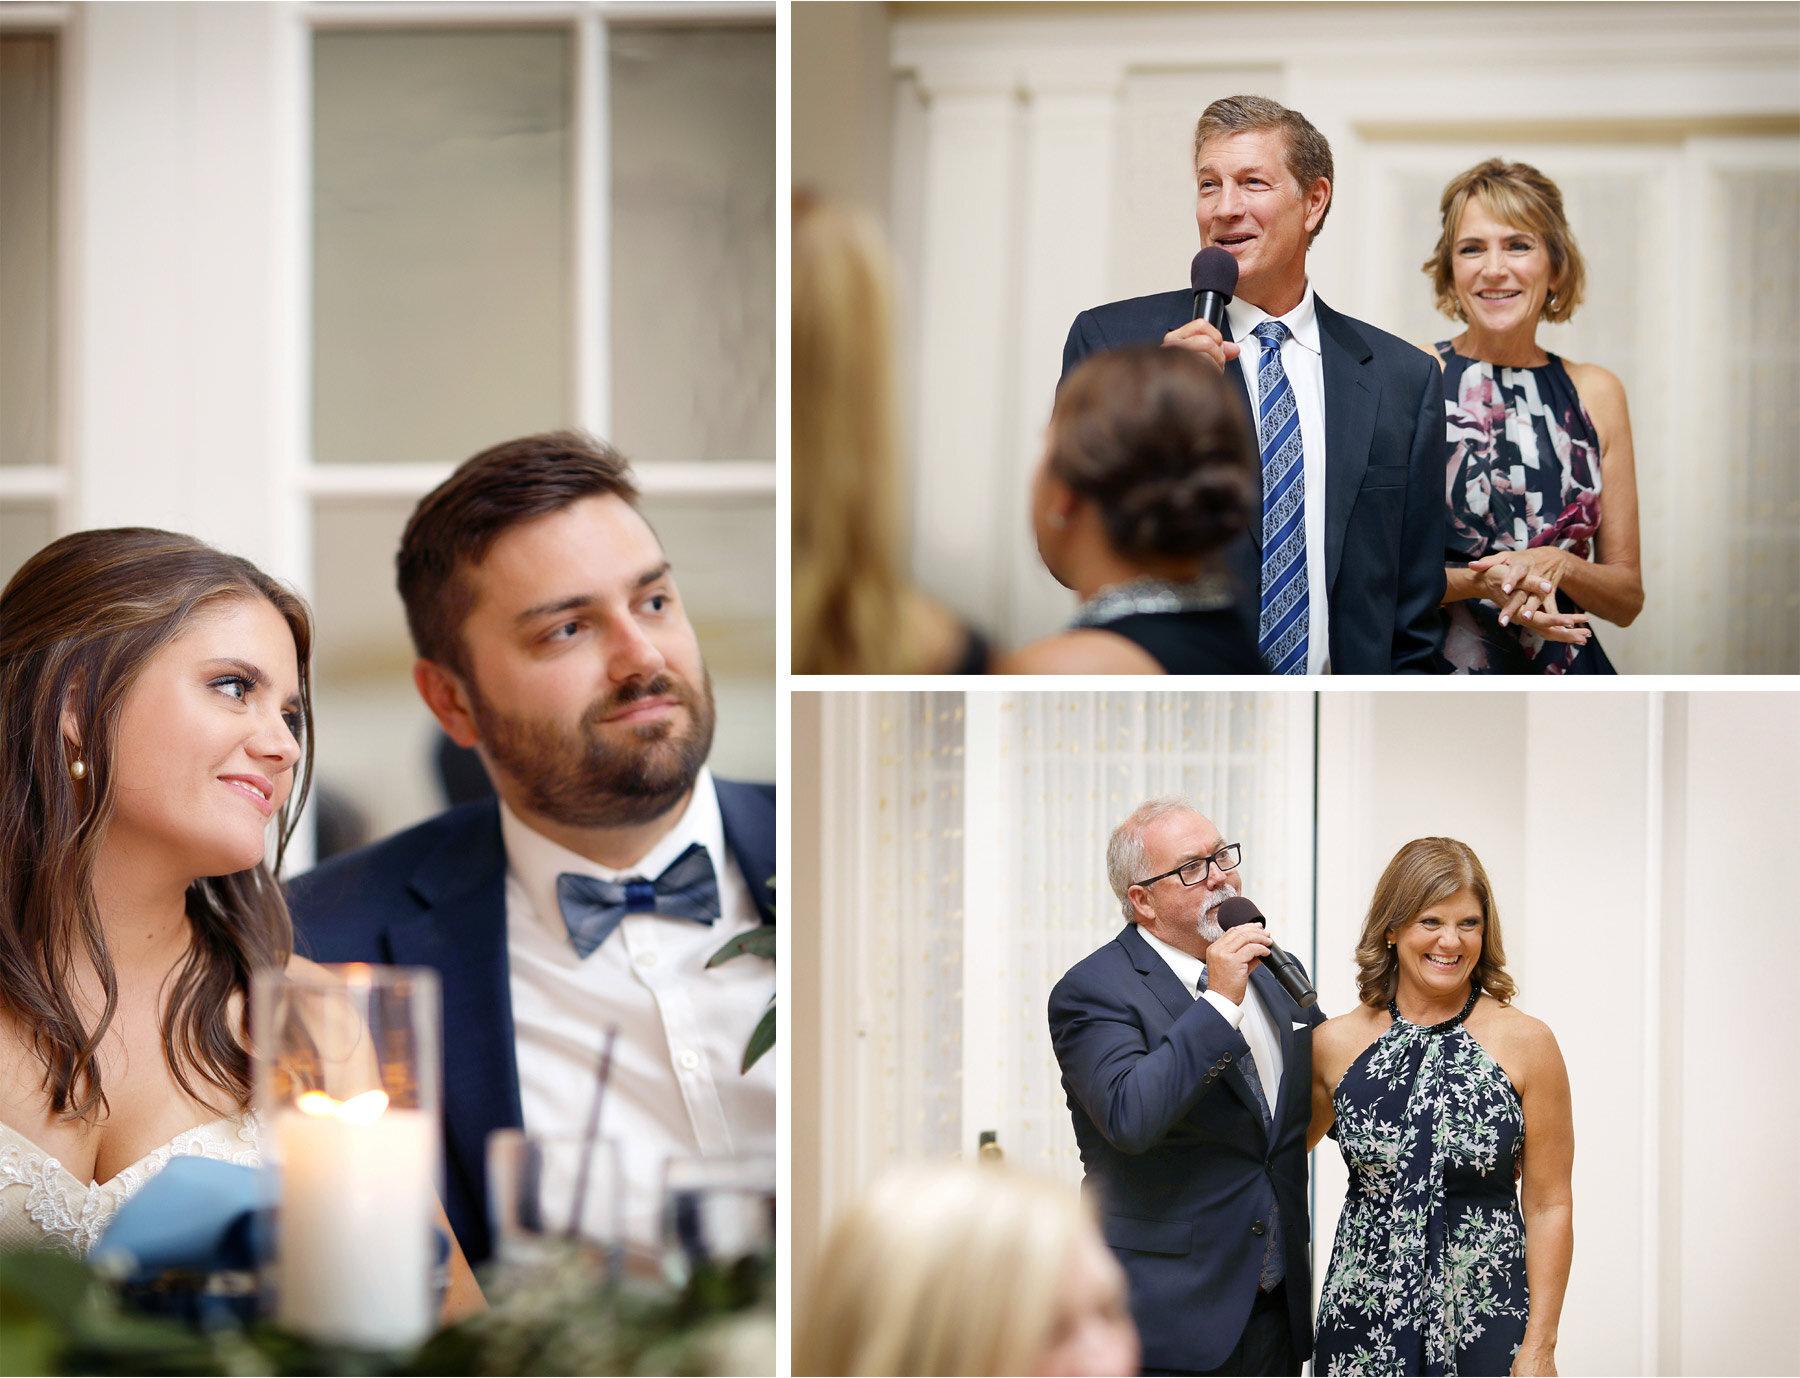 17-Vick-Photography-Wedding-Minnetonka-Minnesota-Lafayette-Club-Reception-Toasts-Katie-and-David.jpg